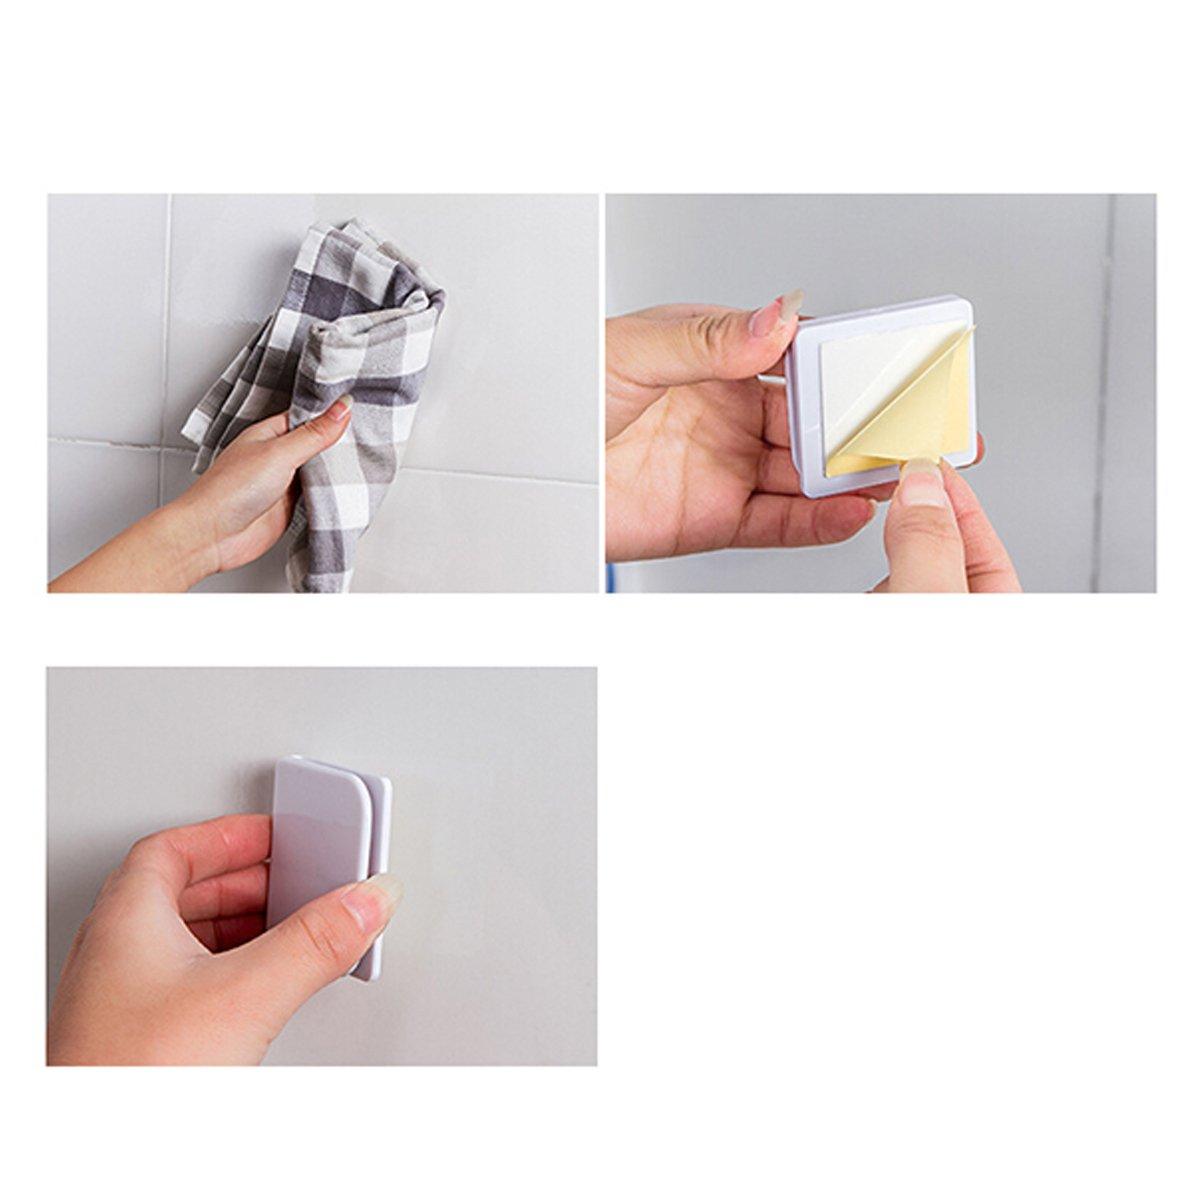 Bianco Anti Splash tenda da doccia e clip bestomz 4/pezzi etichetta tenda clip